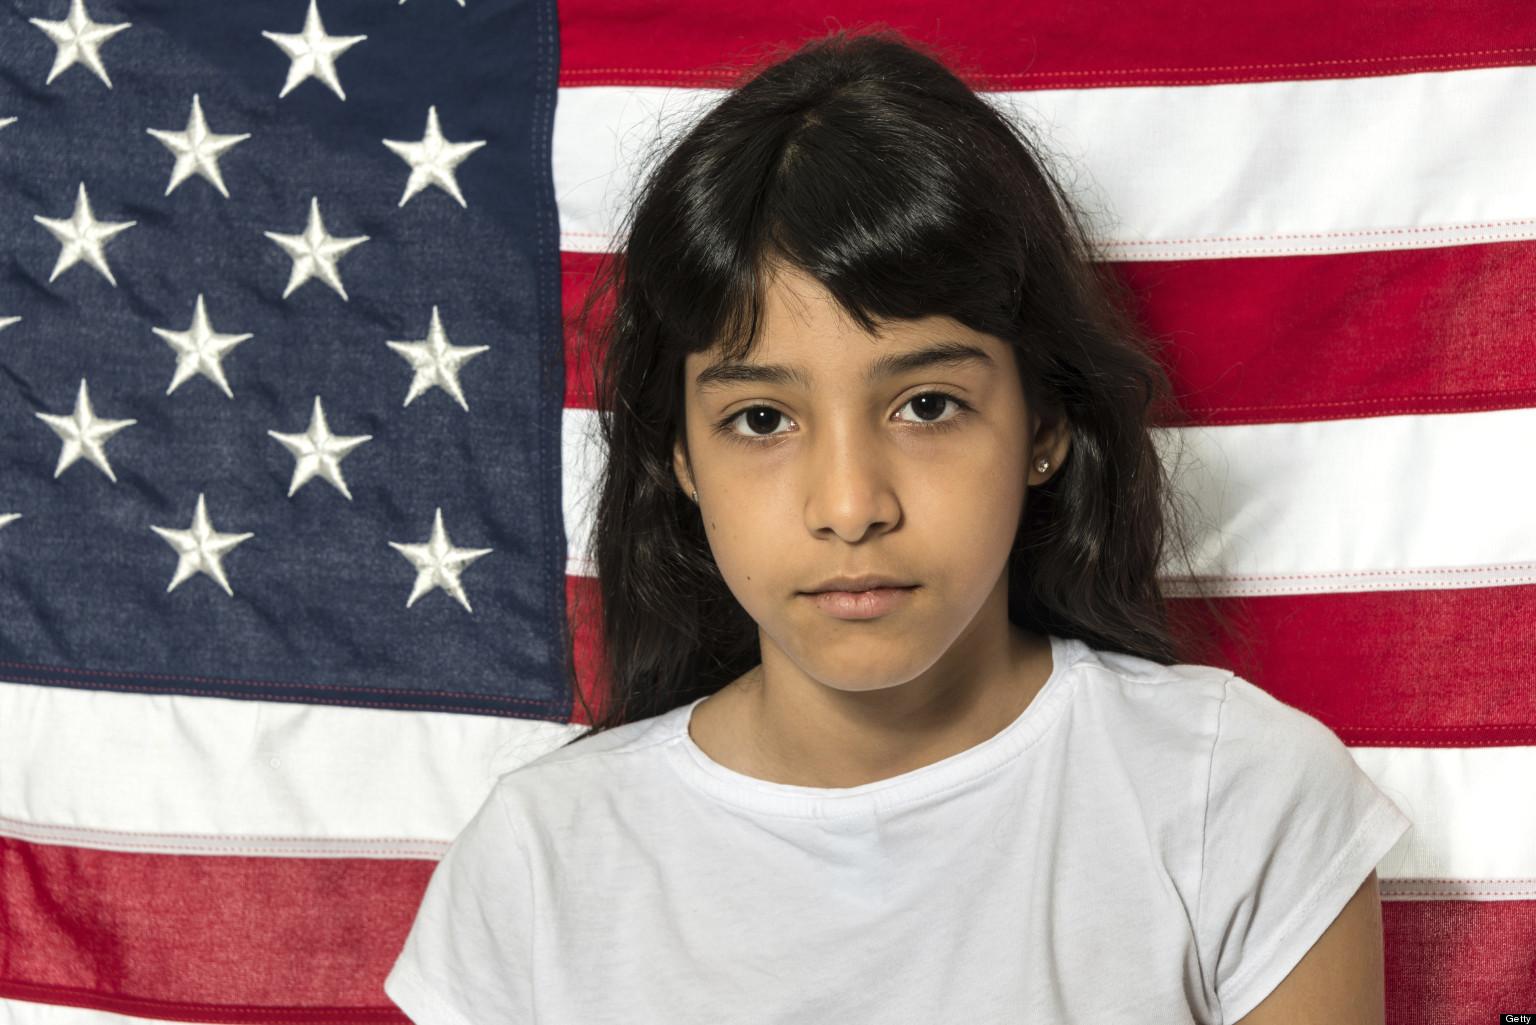 U.S. Multiculturalism or Cultural Assimilation?